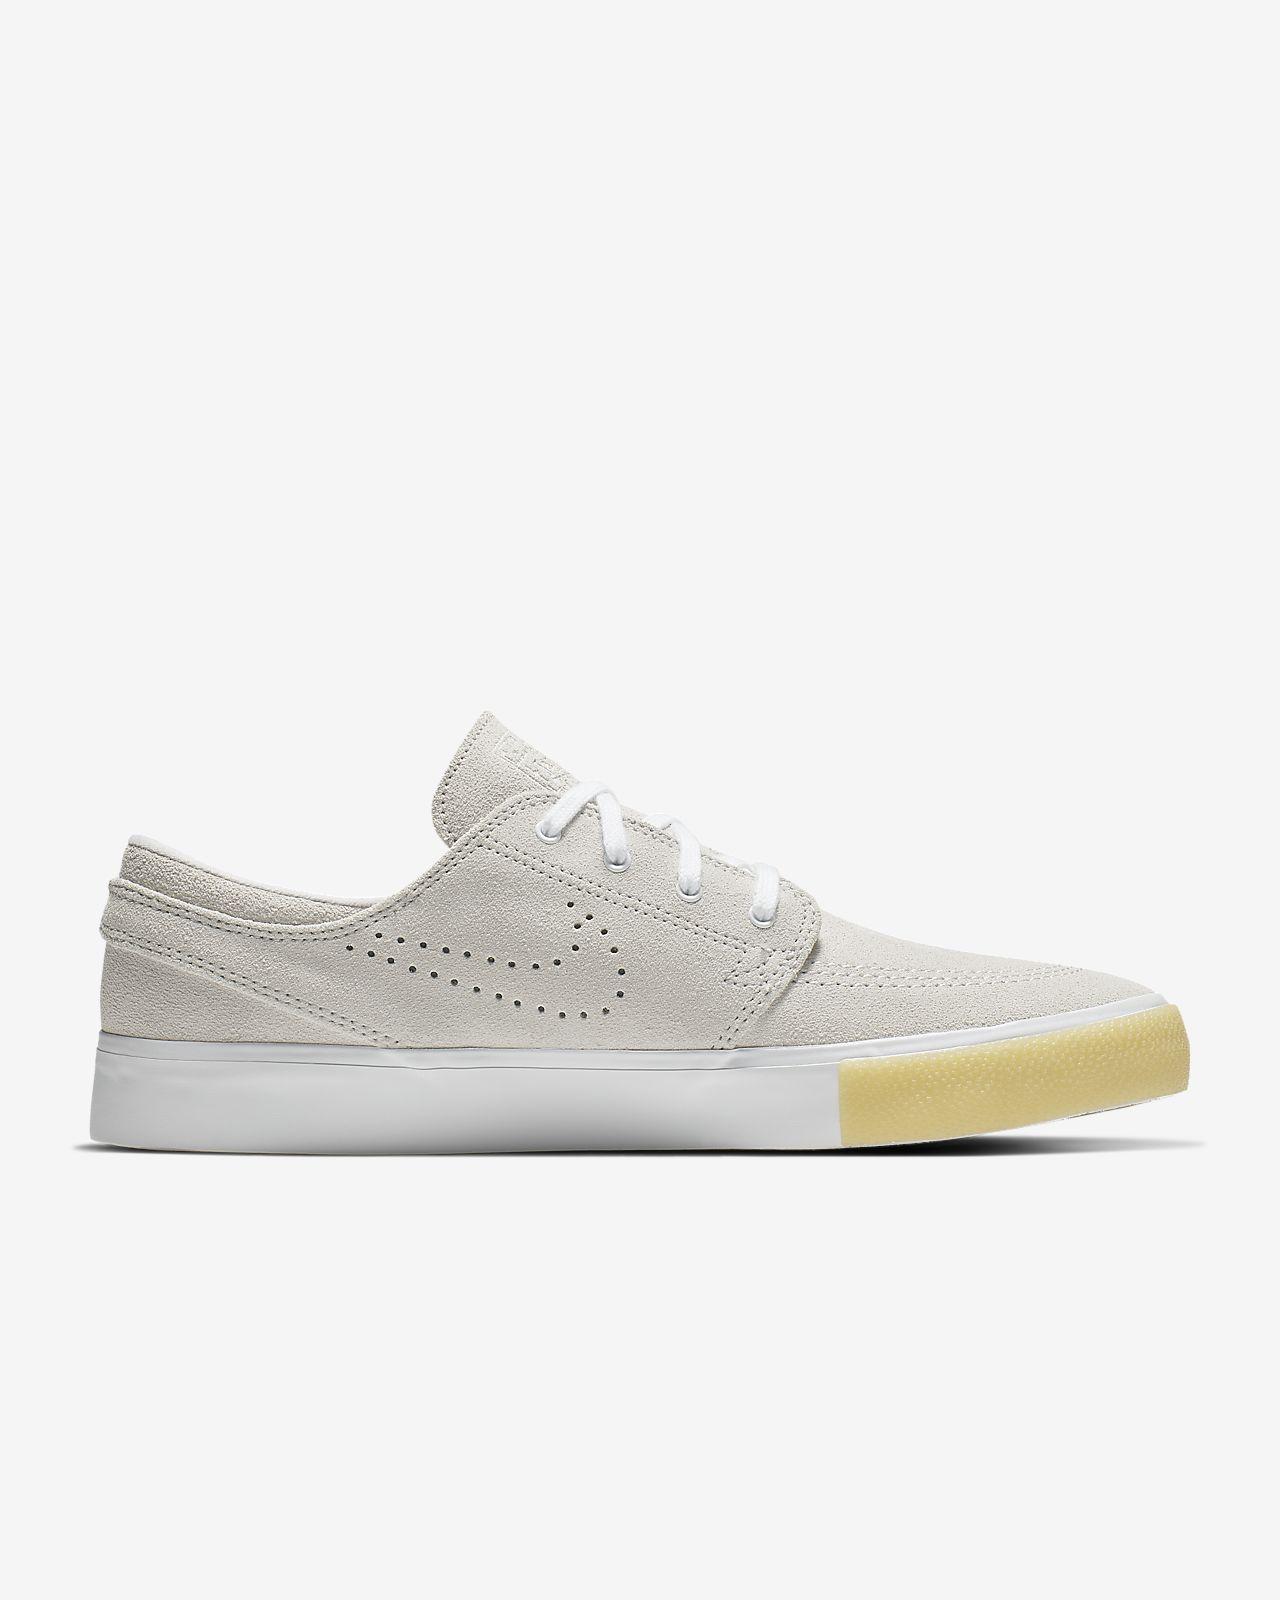 Sapatilhas de skateboard Nike SB Zoom Stefan Janoski RM SE